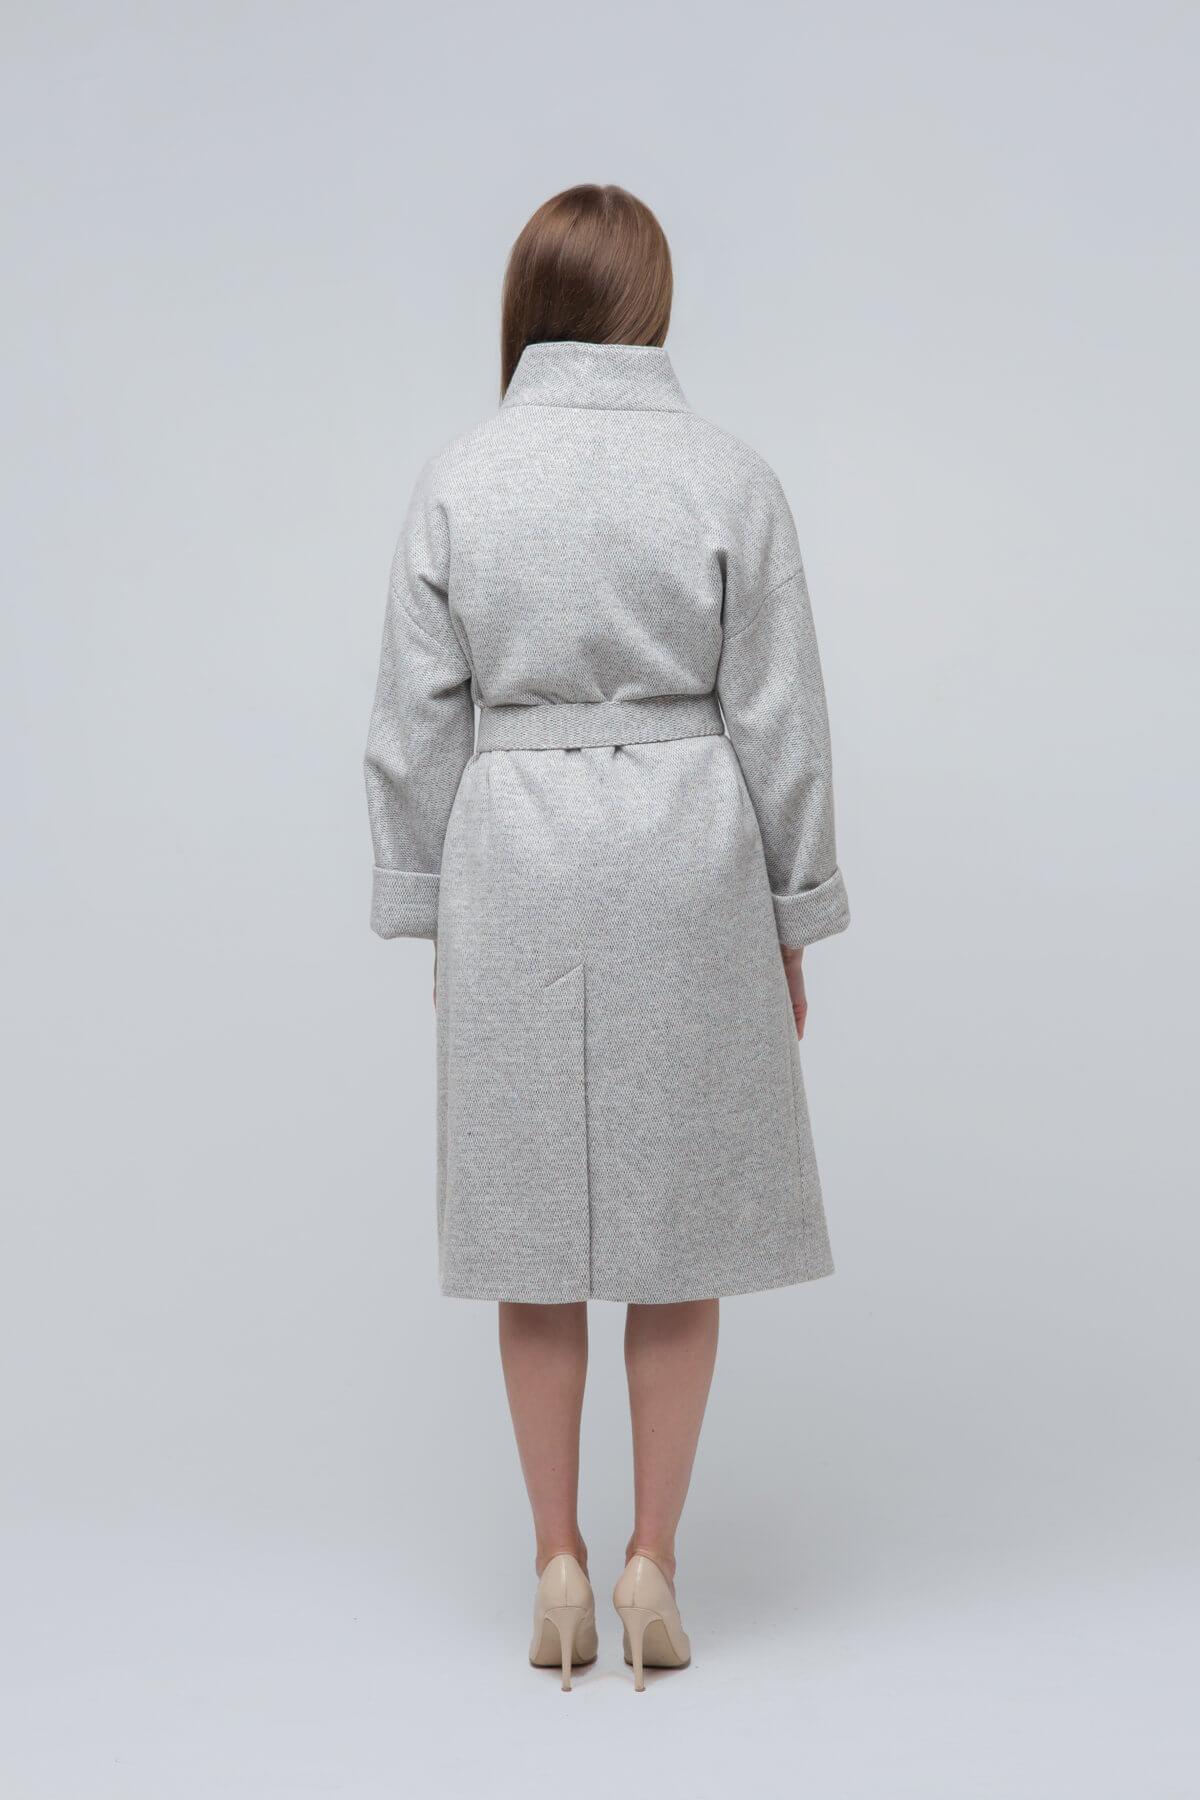 Пальто из текстиля. Фото 5